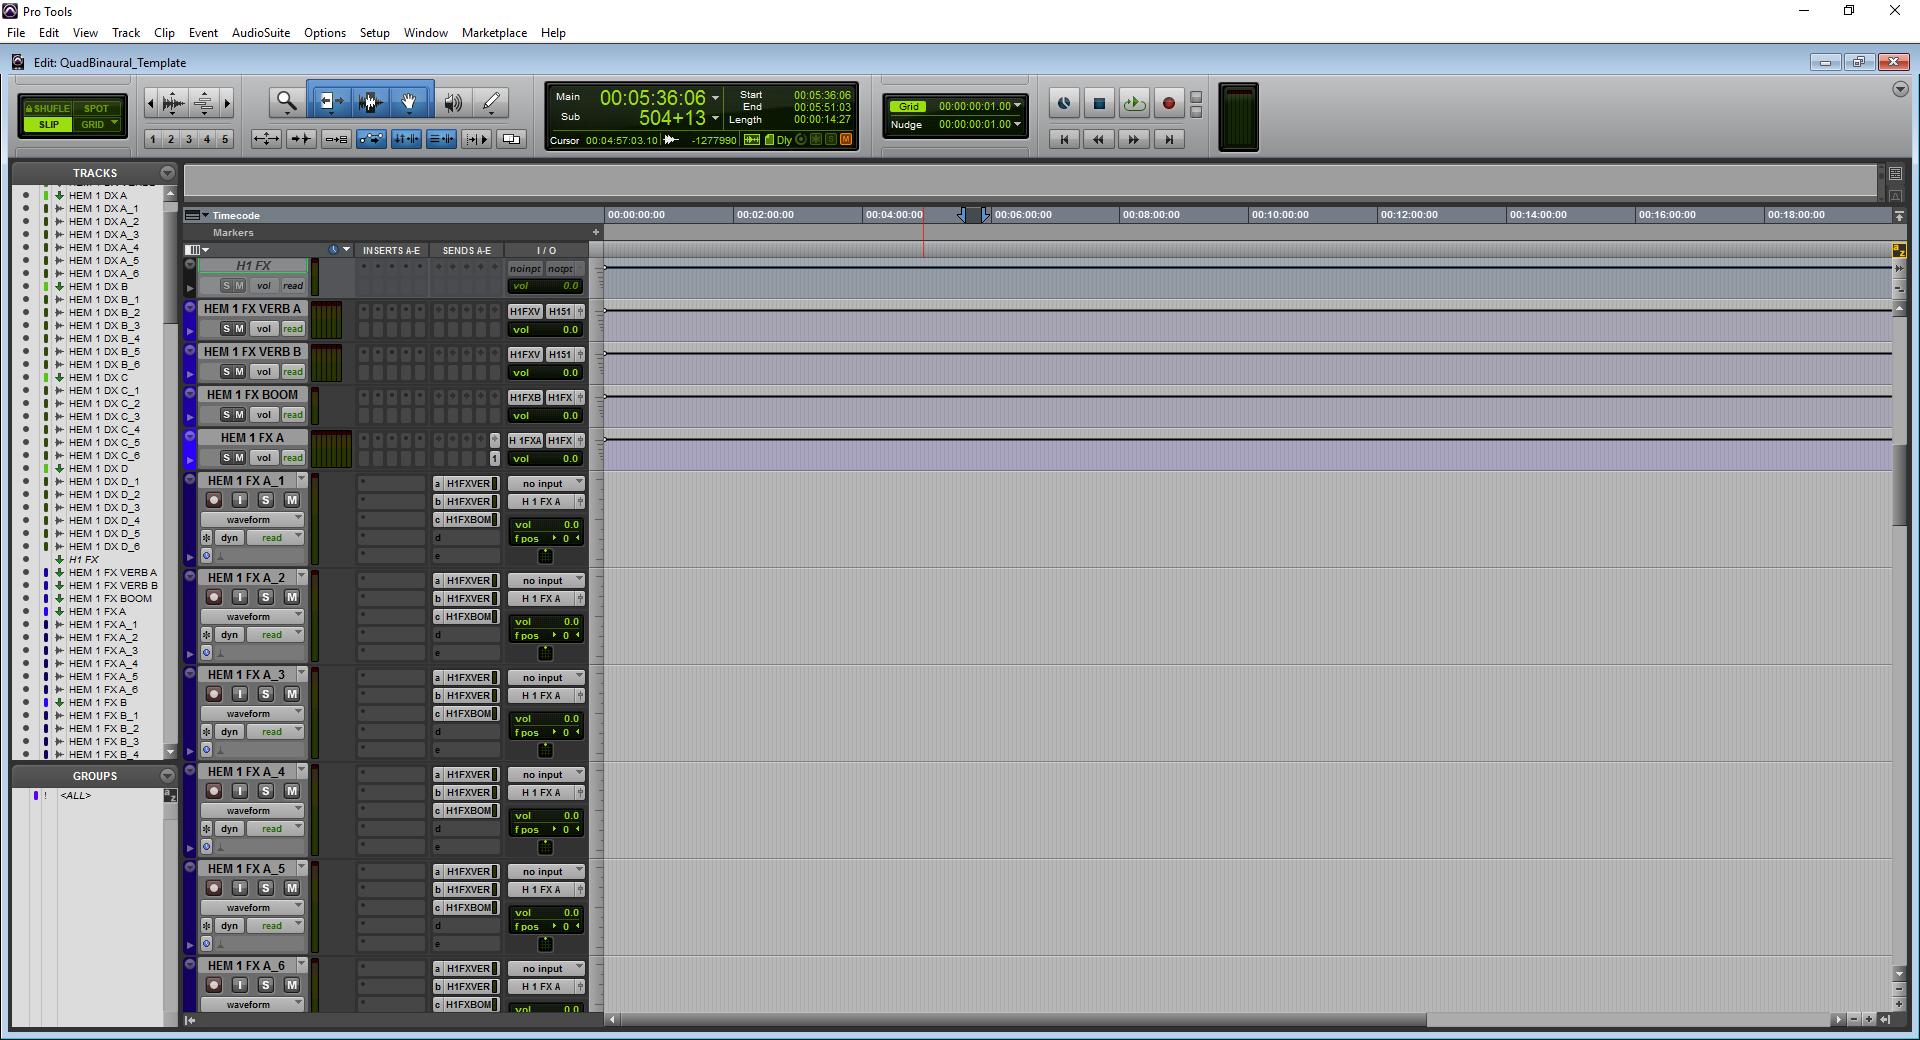 A screenshot of Pro Tools showing the FX predub